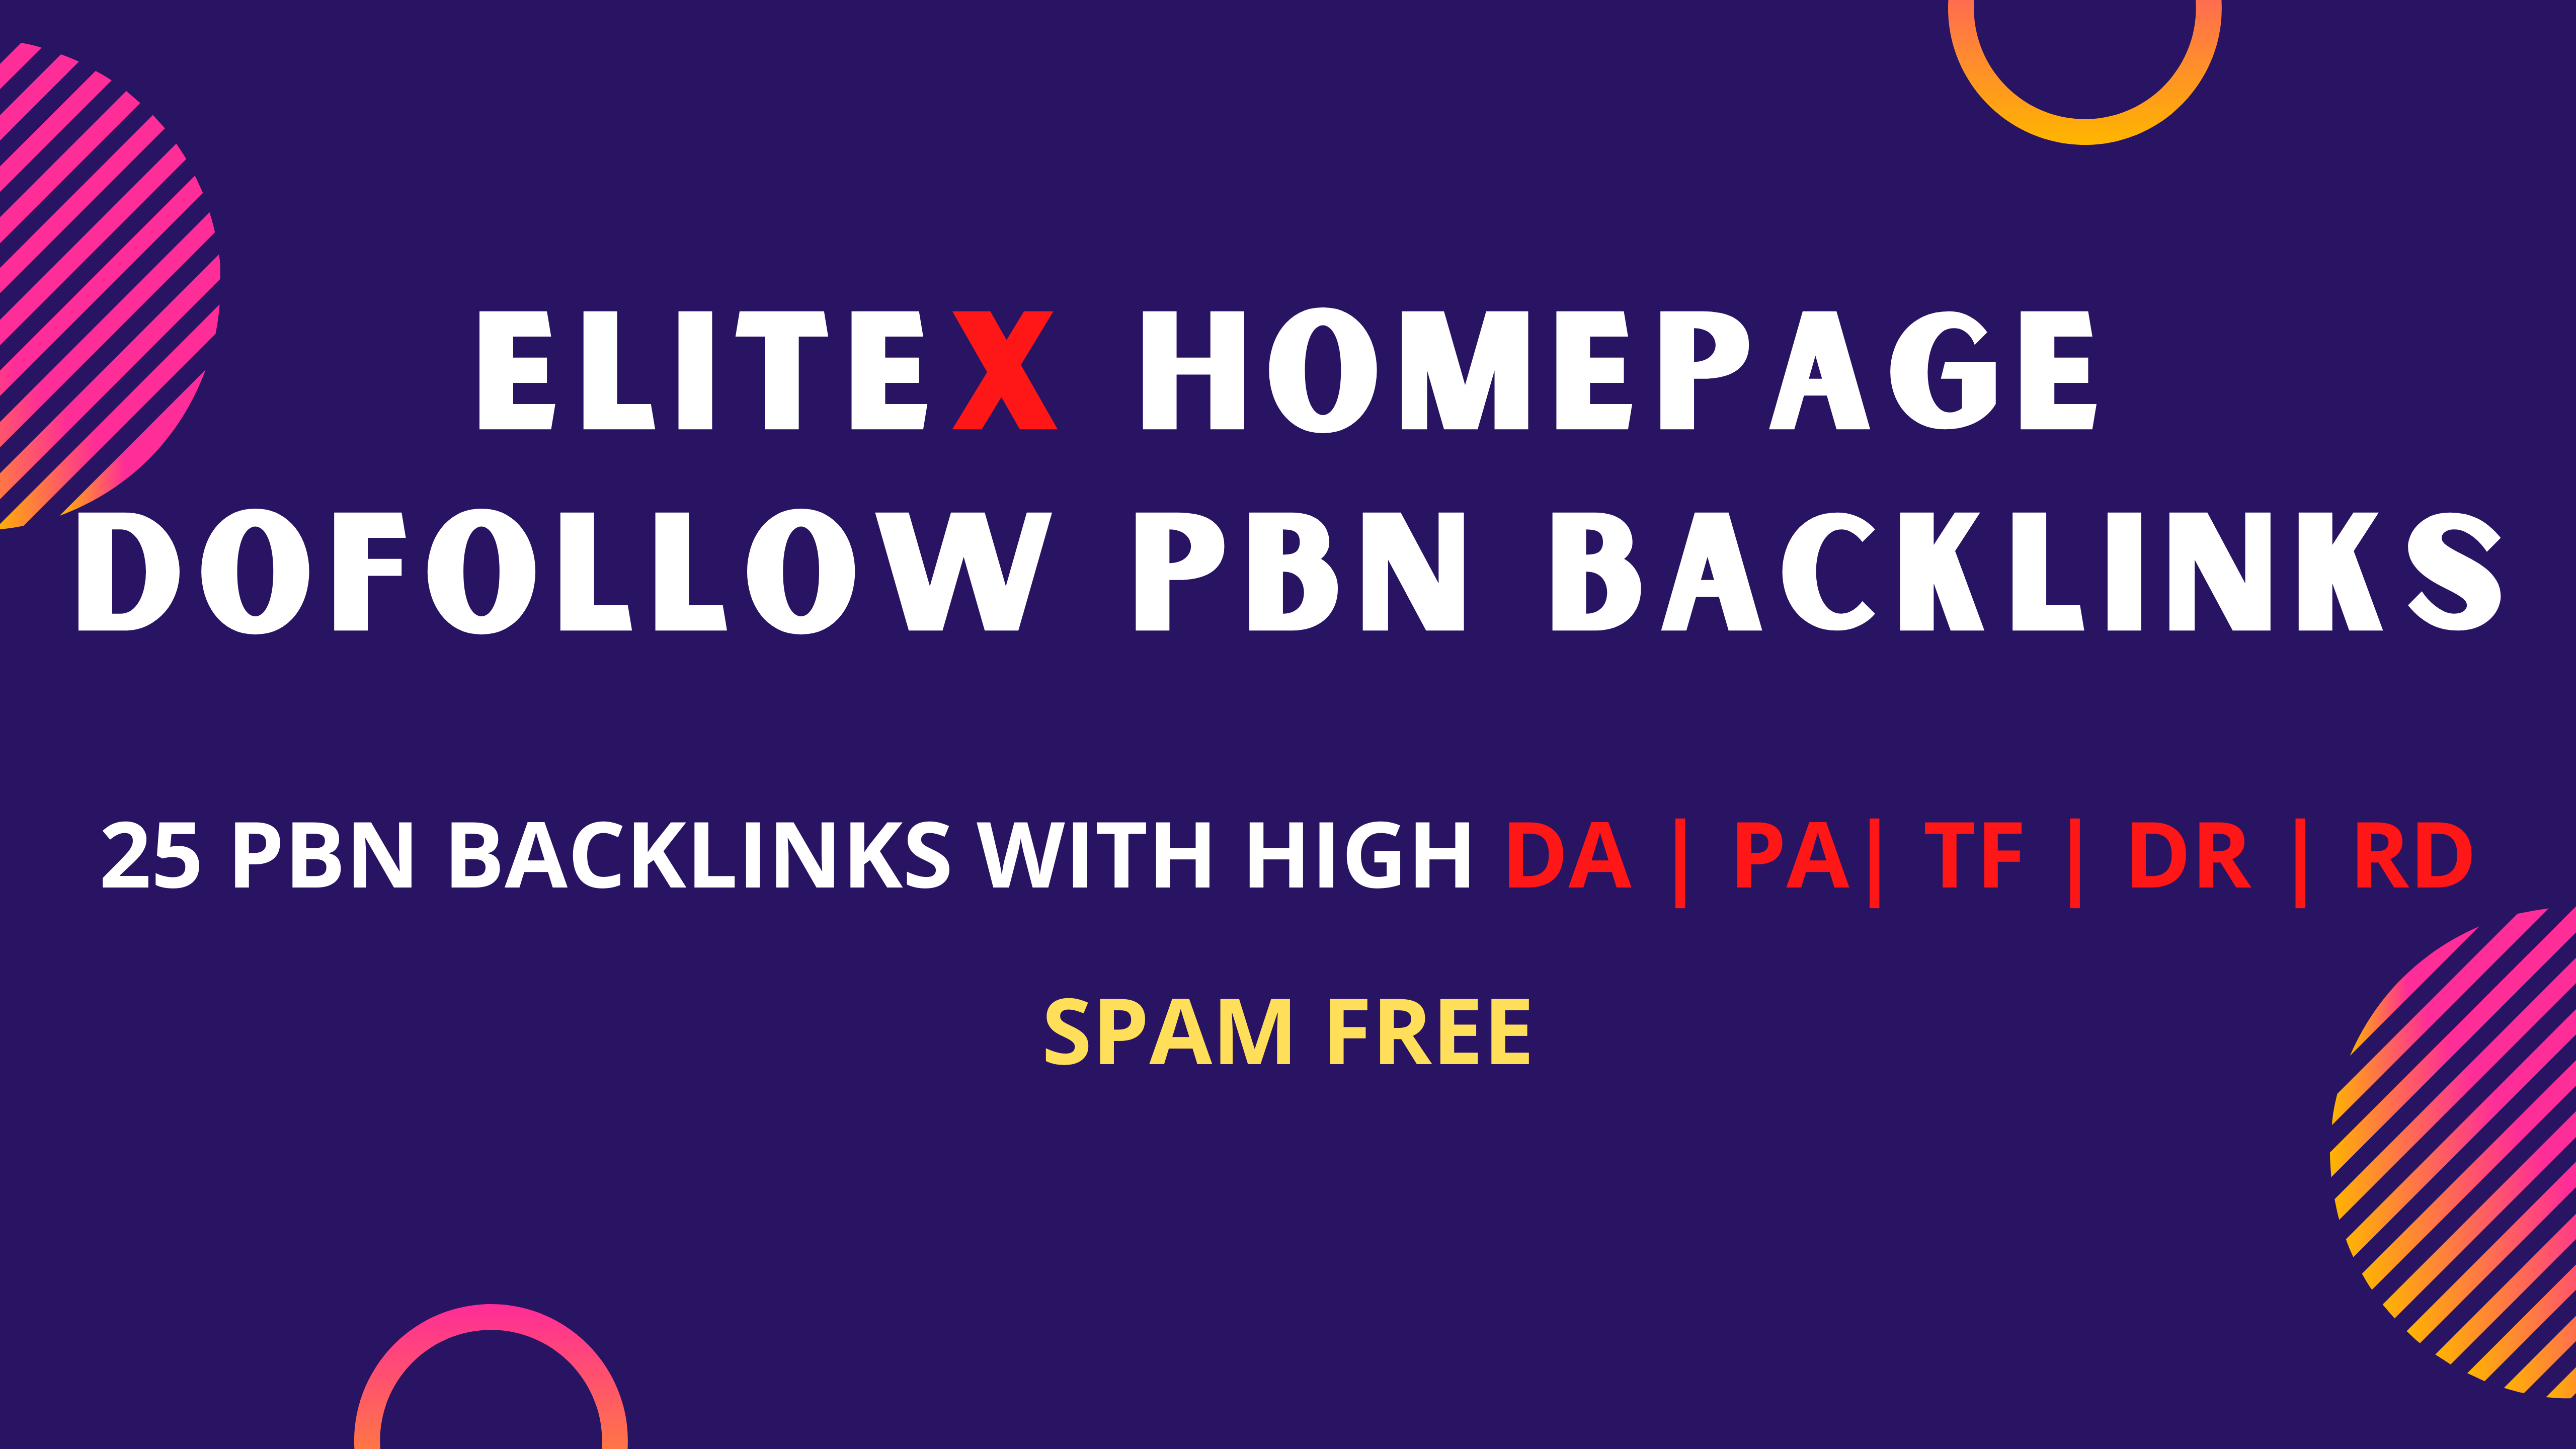 Build 25 Dofollow High DA/TF/DR HomePage PBN Links